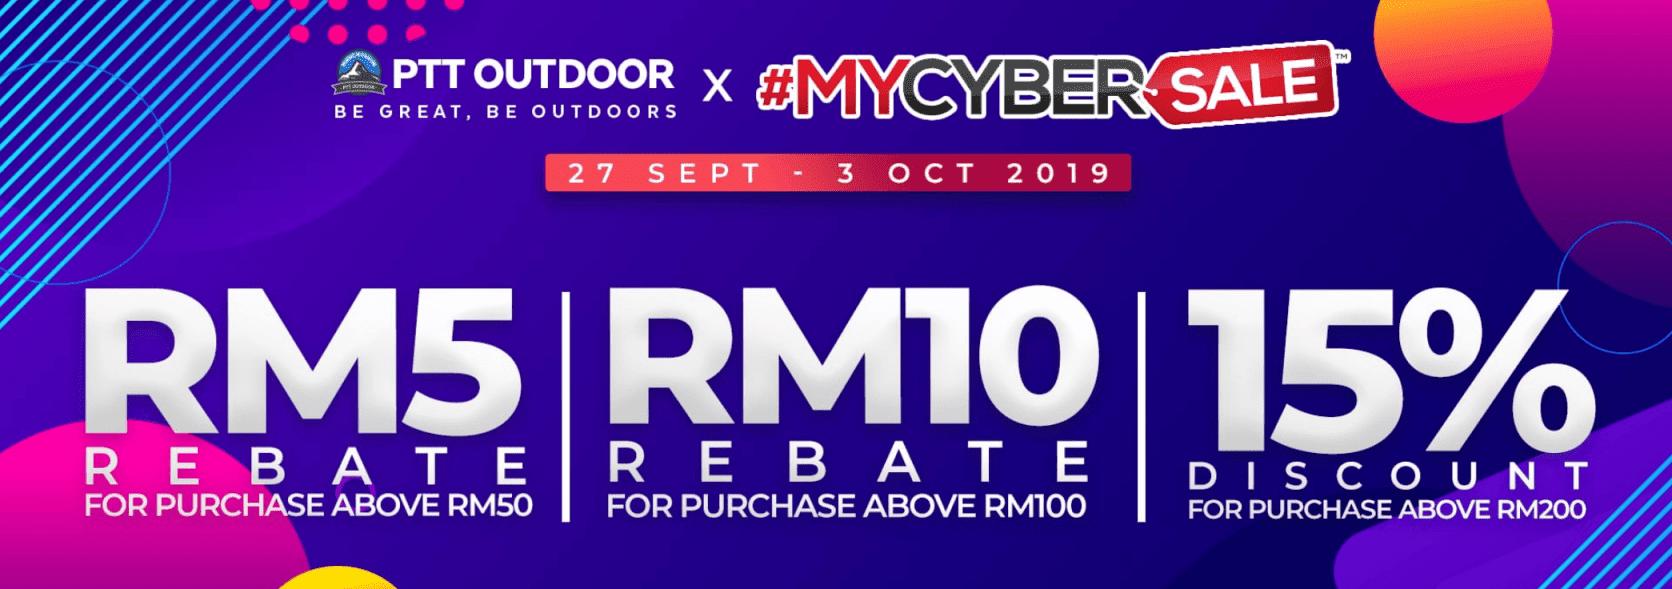 PTT Outdoor mycybersale promo